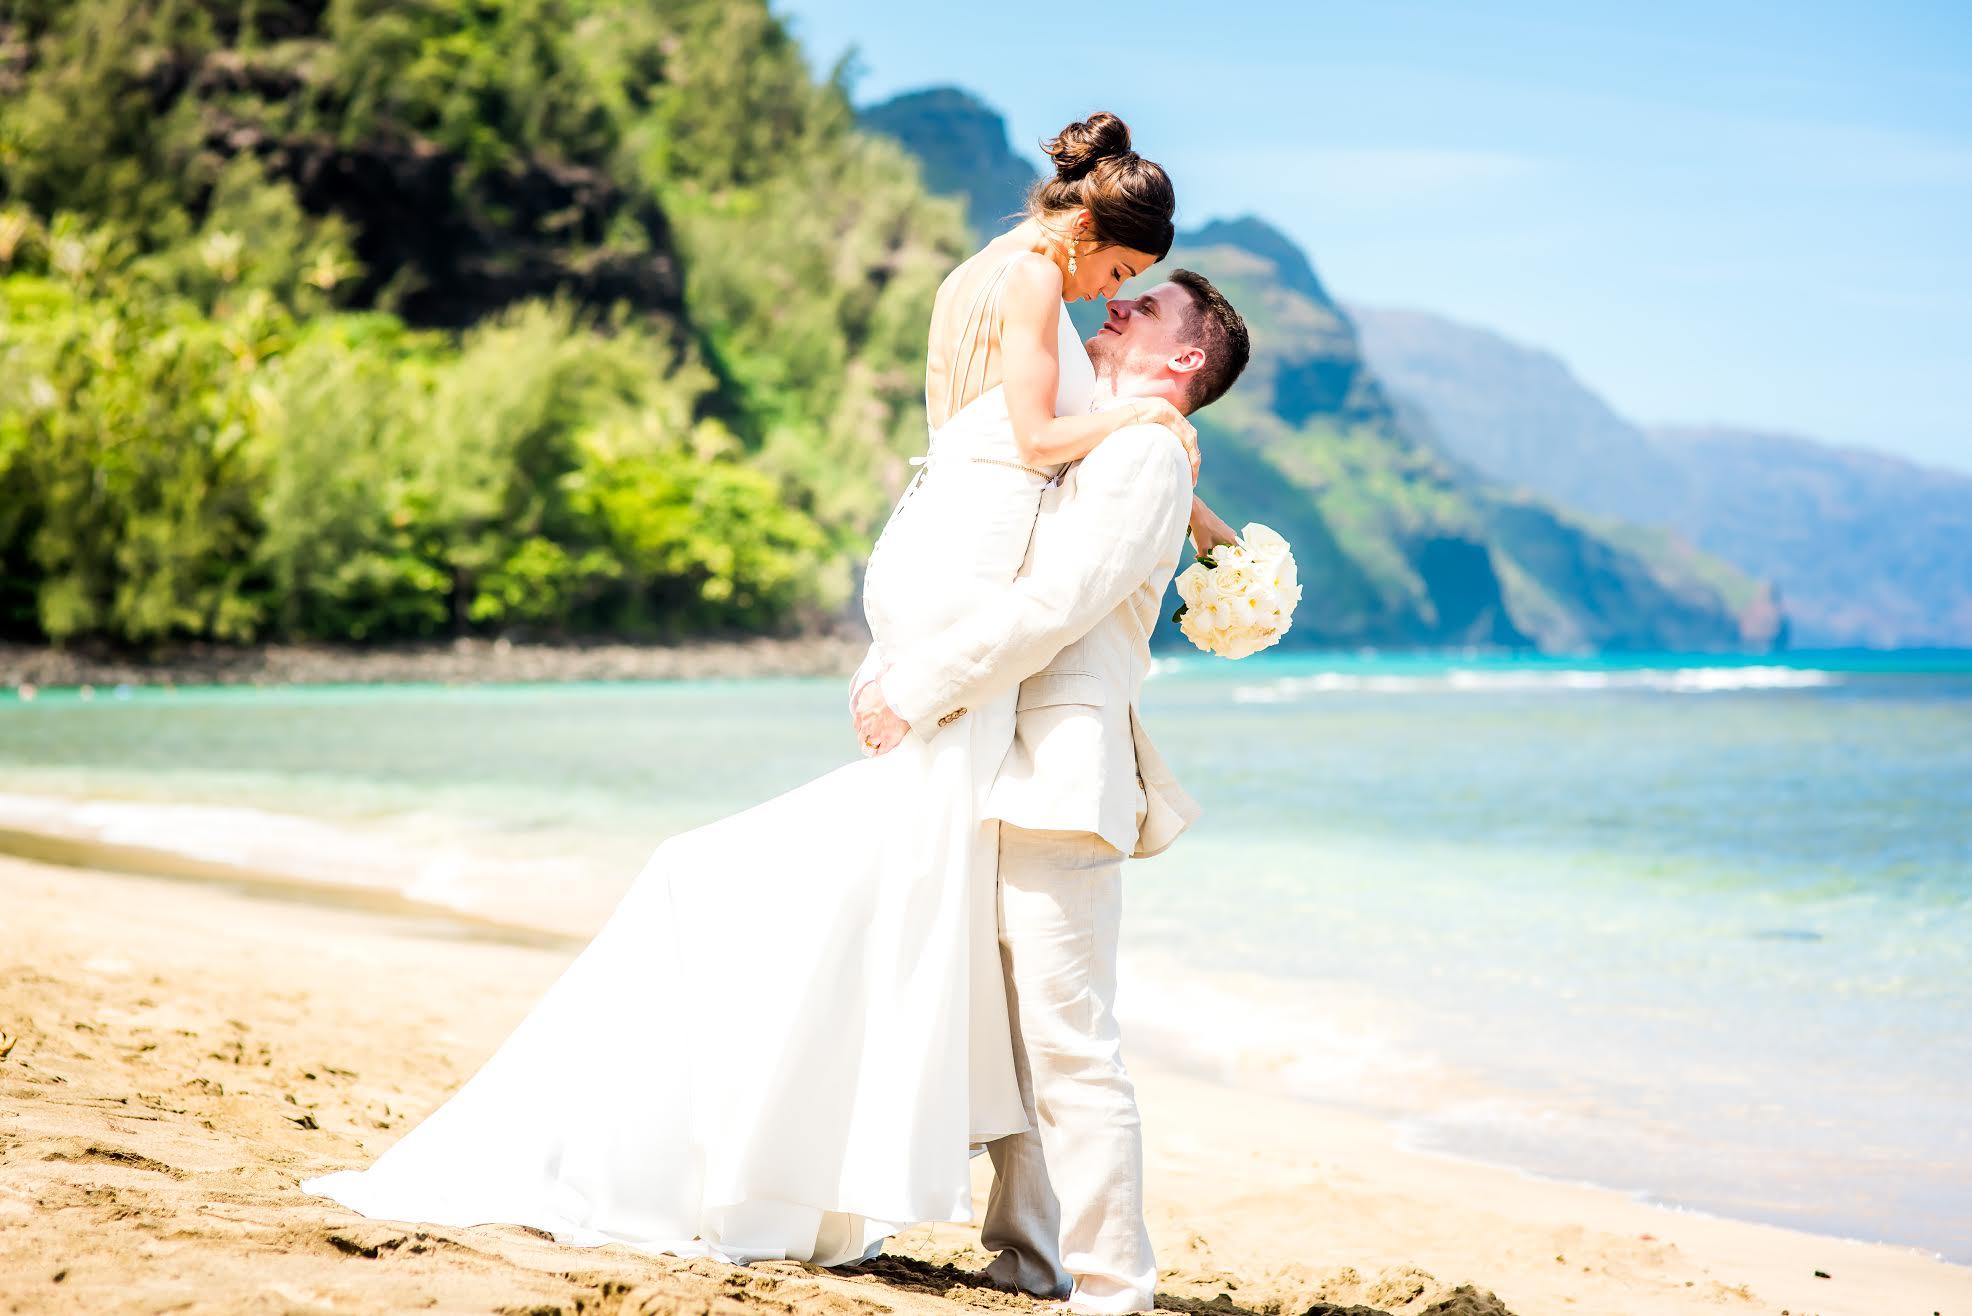 Mike and Katherine on the beach in Kauai.